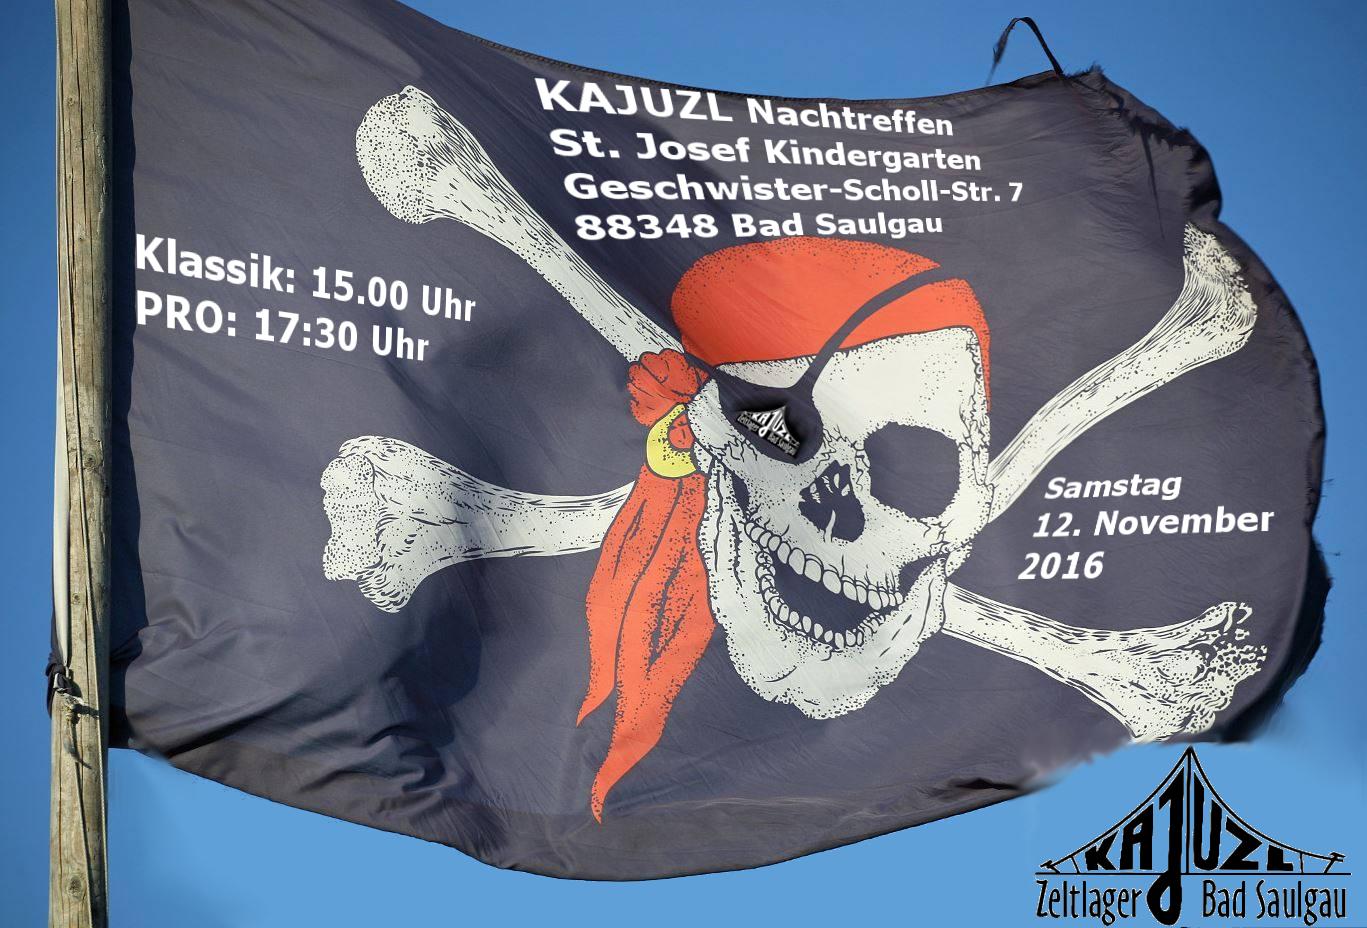 KAJUZL Nachtreffen 2016